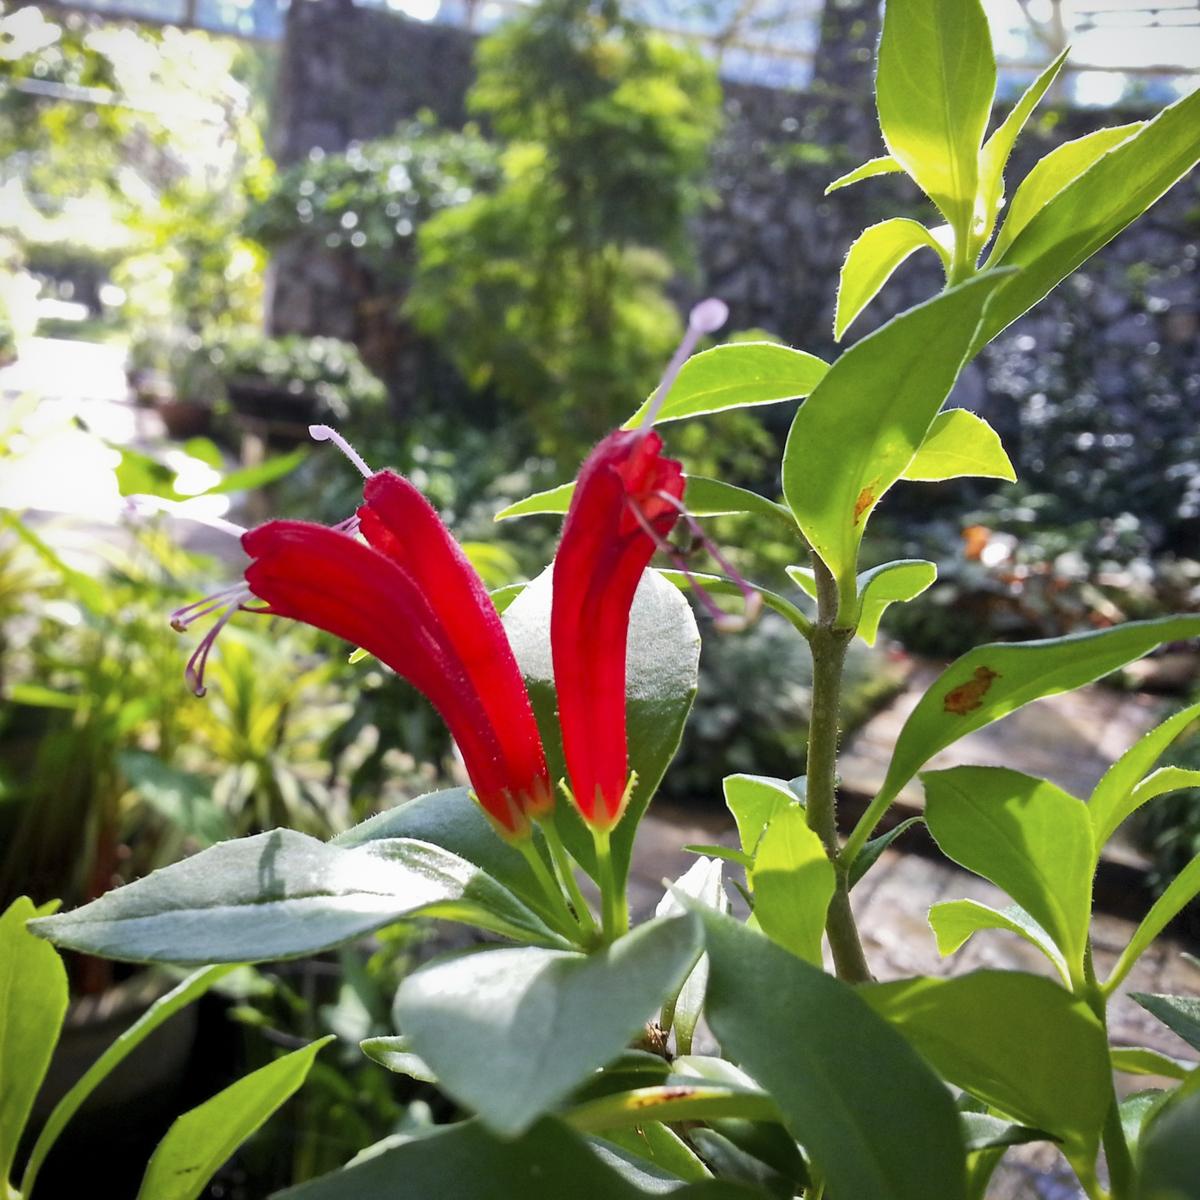 An A-Z List of Cat Friendly Plants - Cat Appy